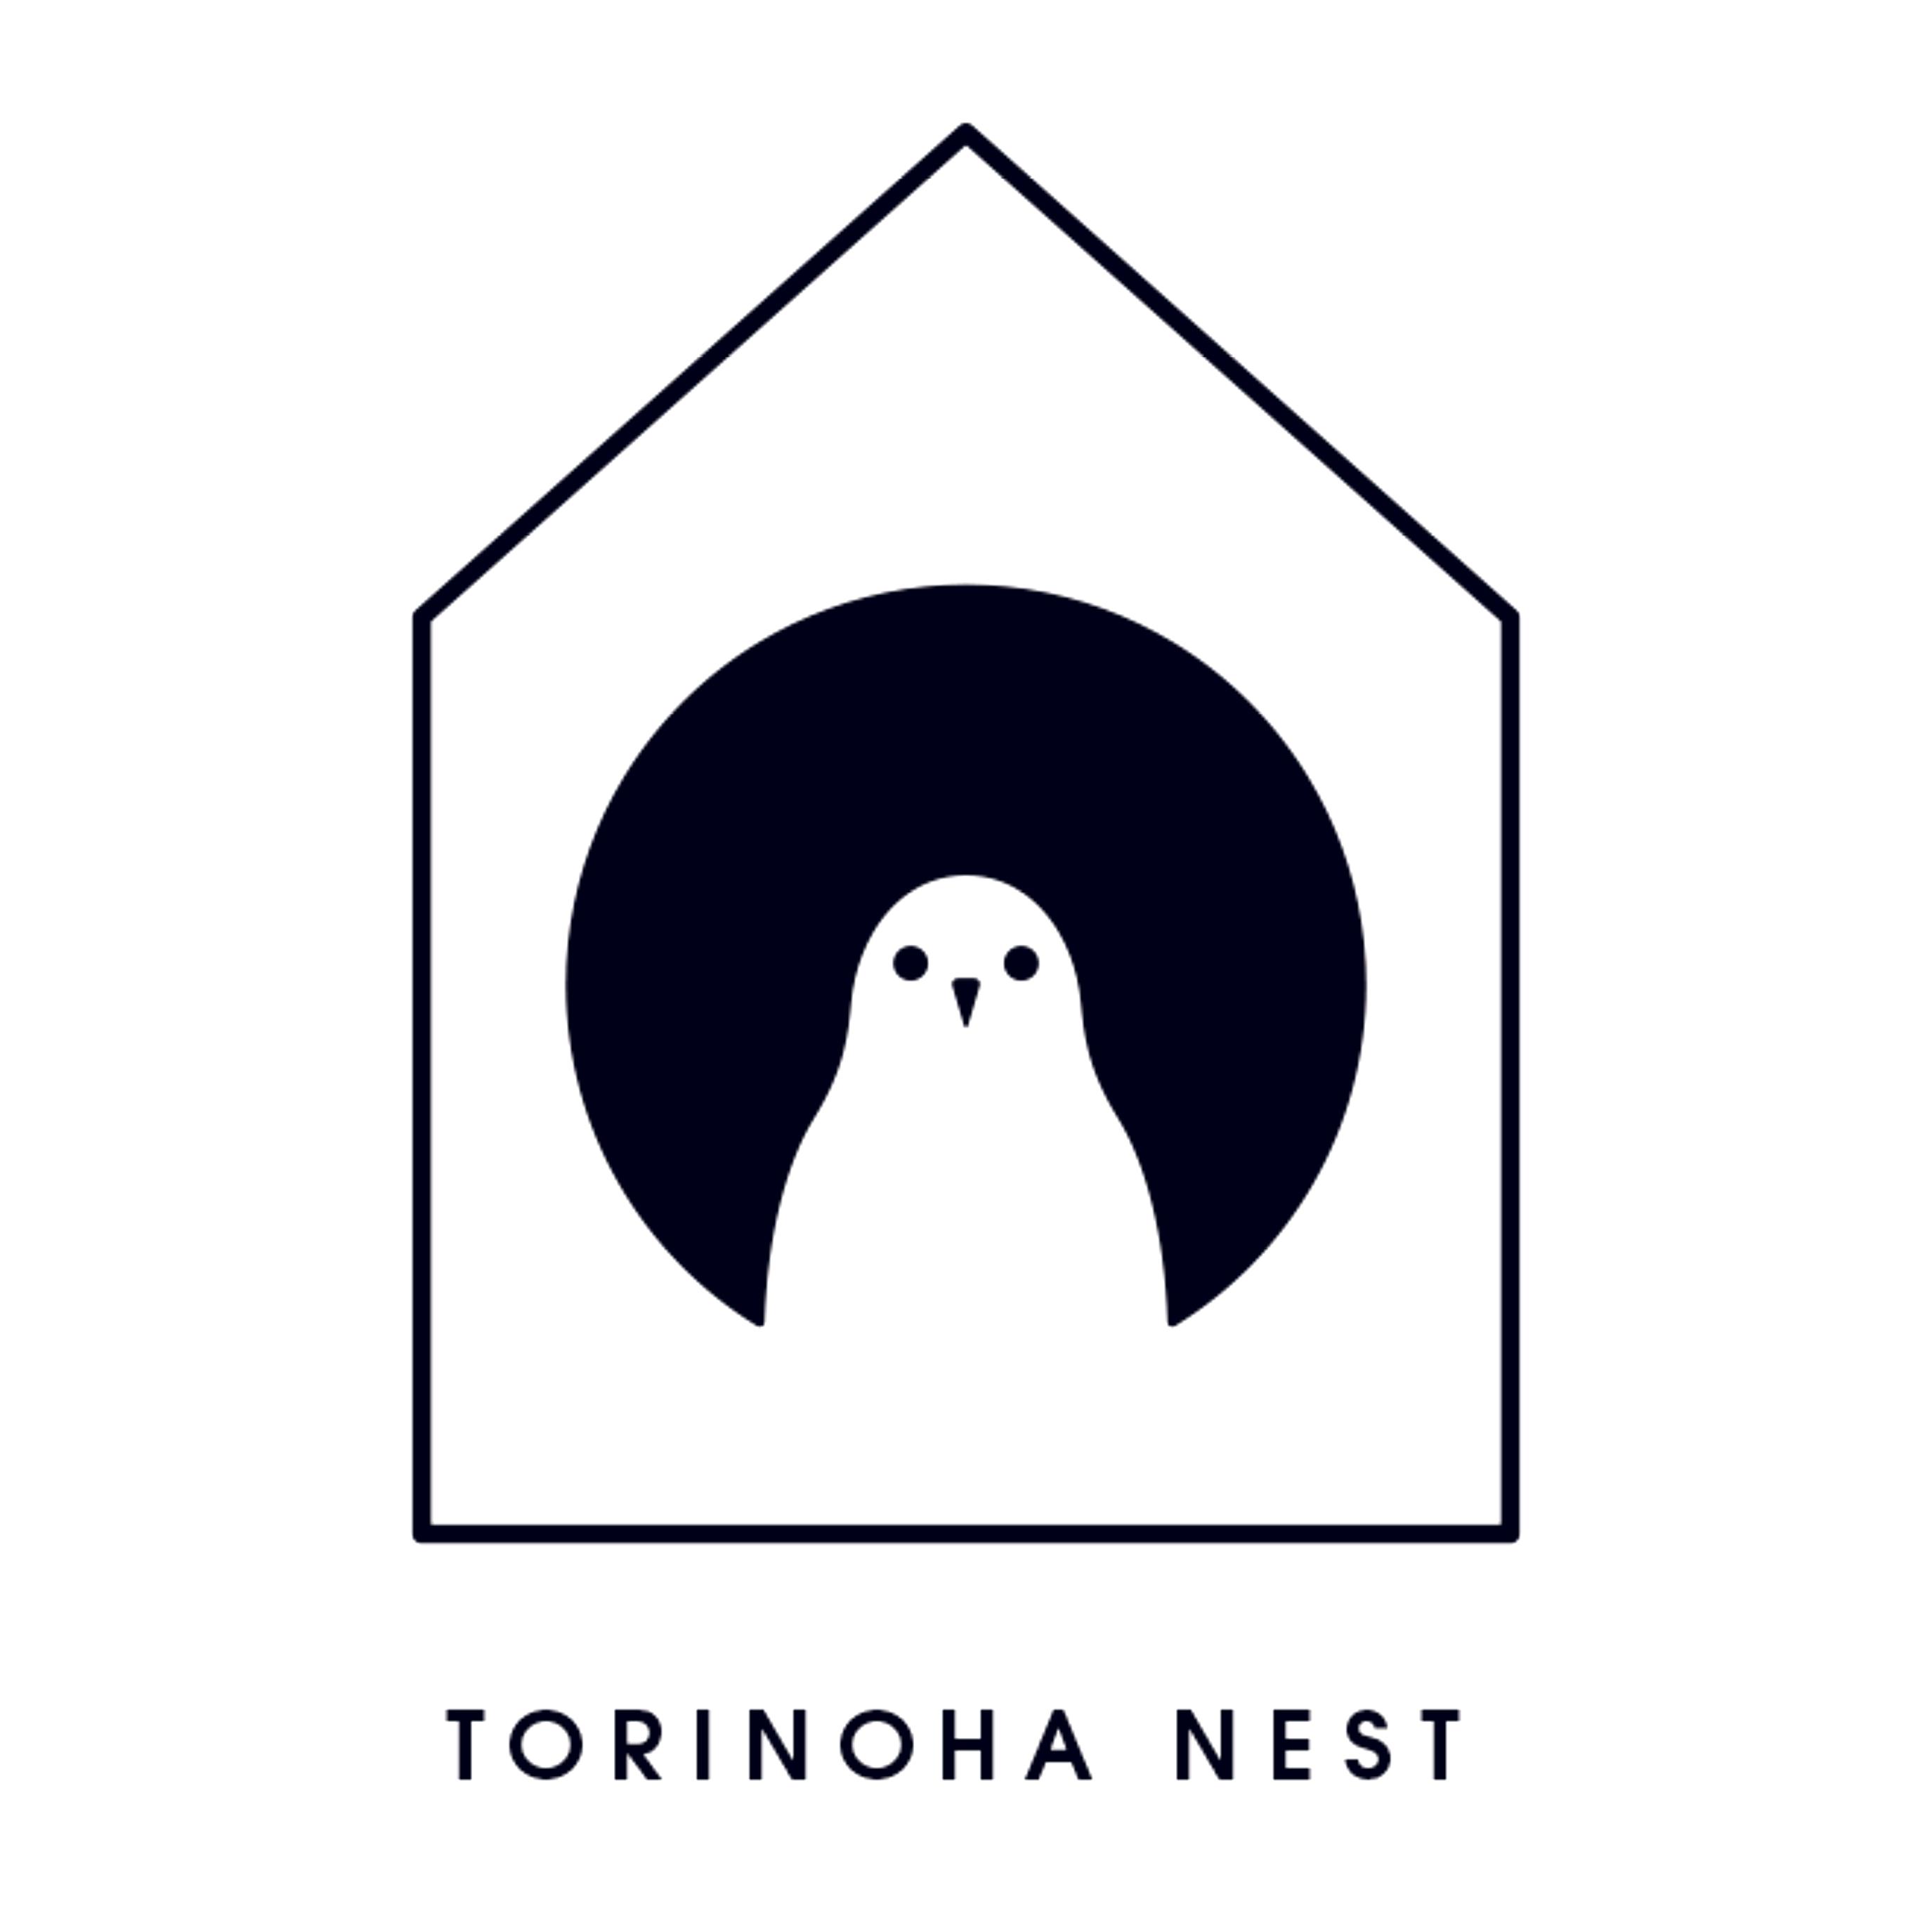 TORINOHA NEST